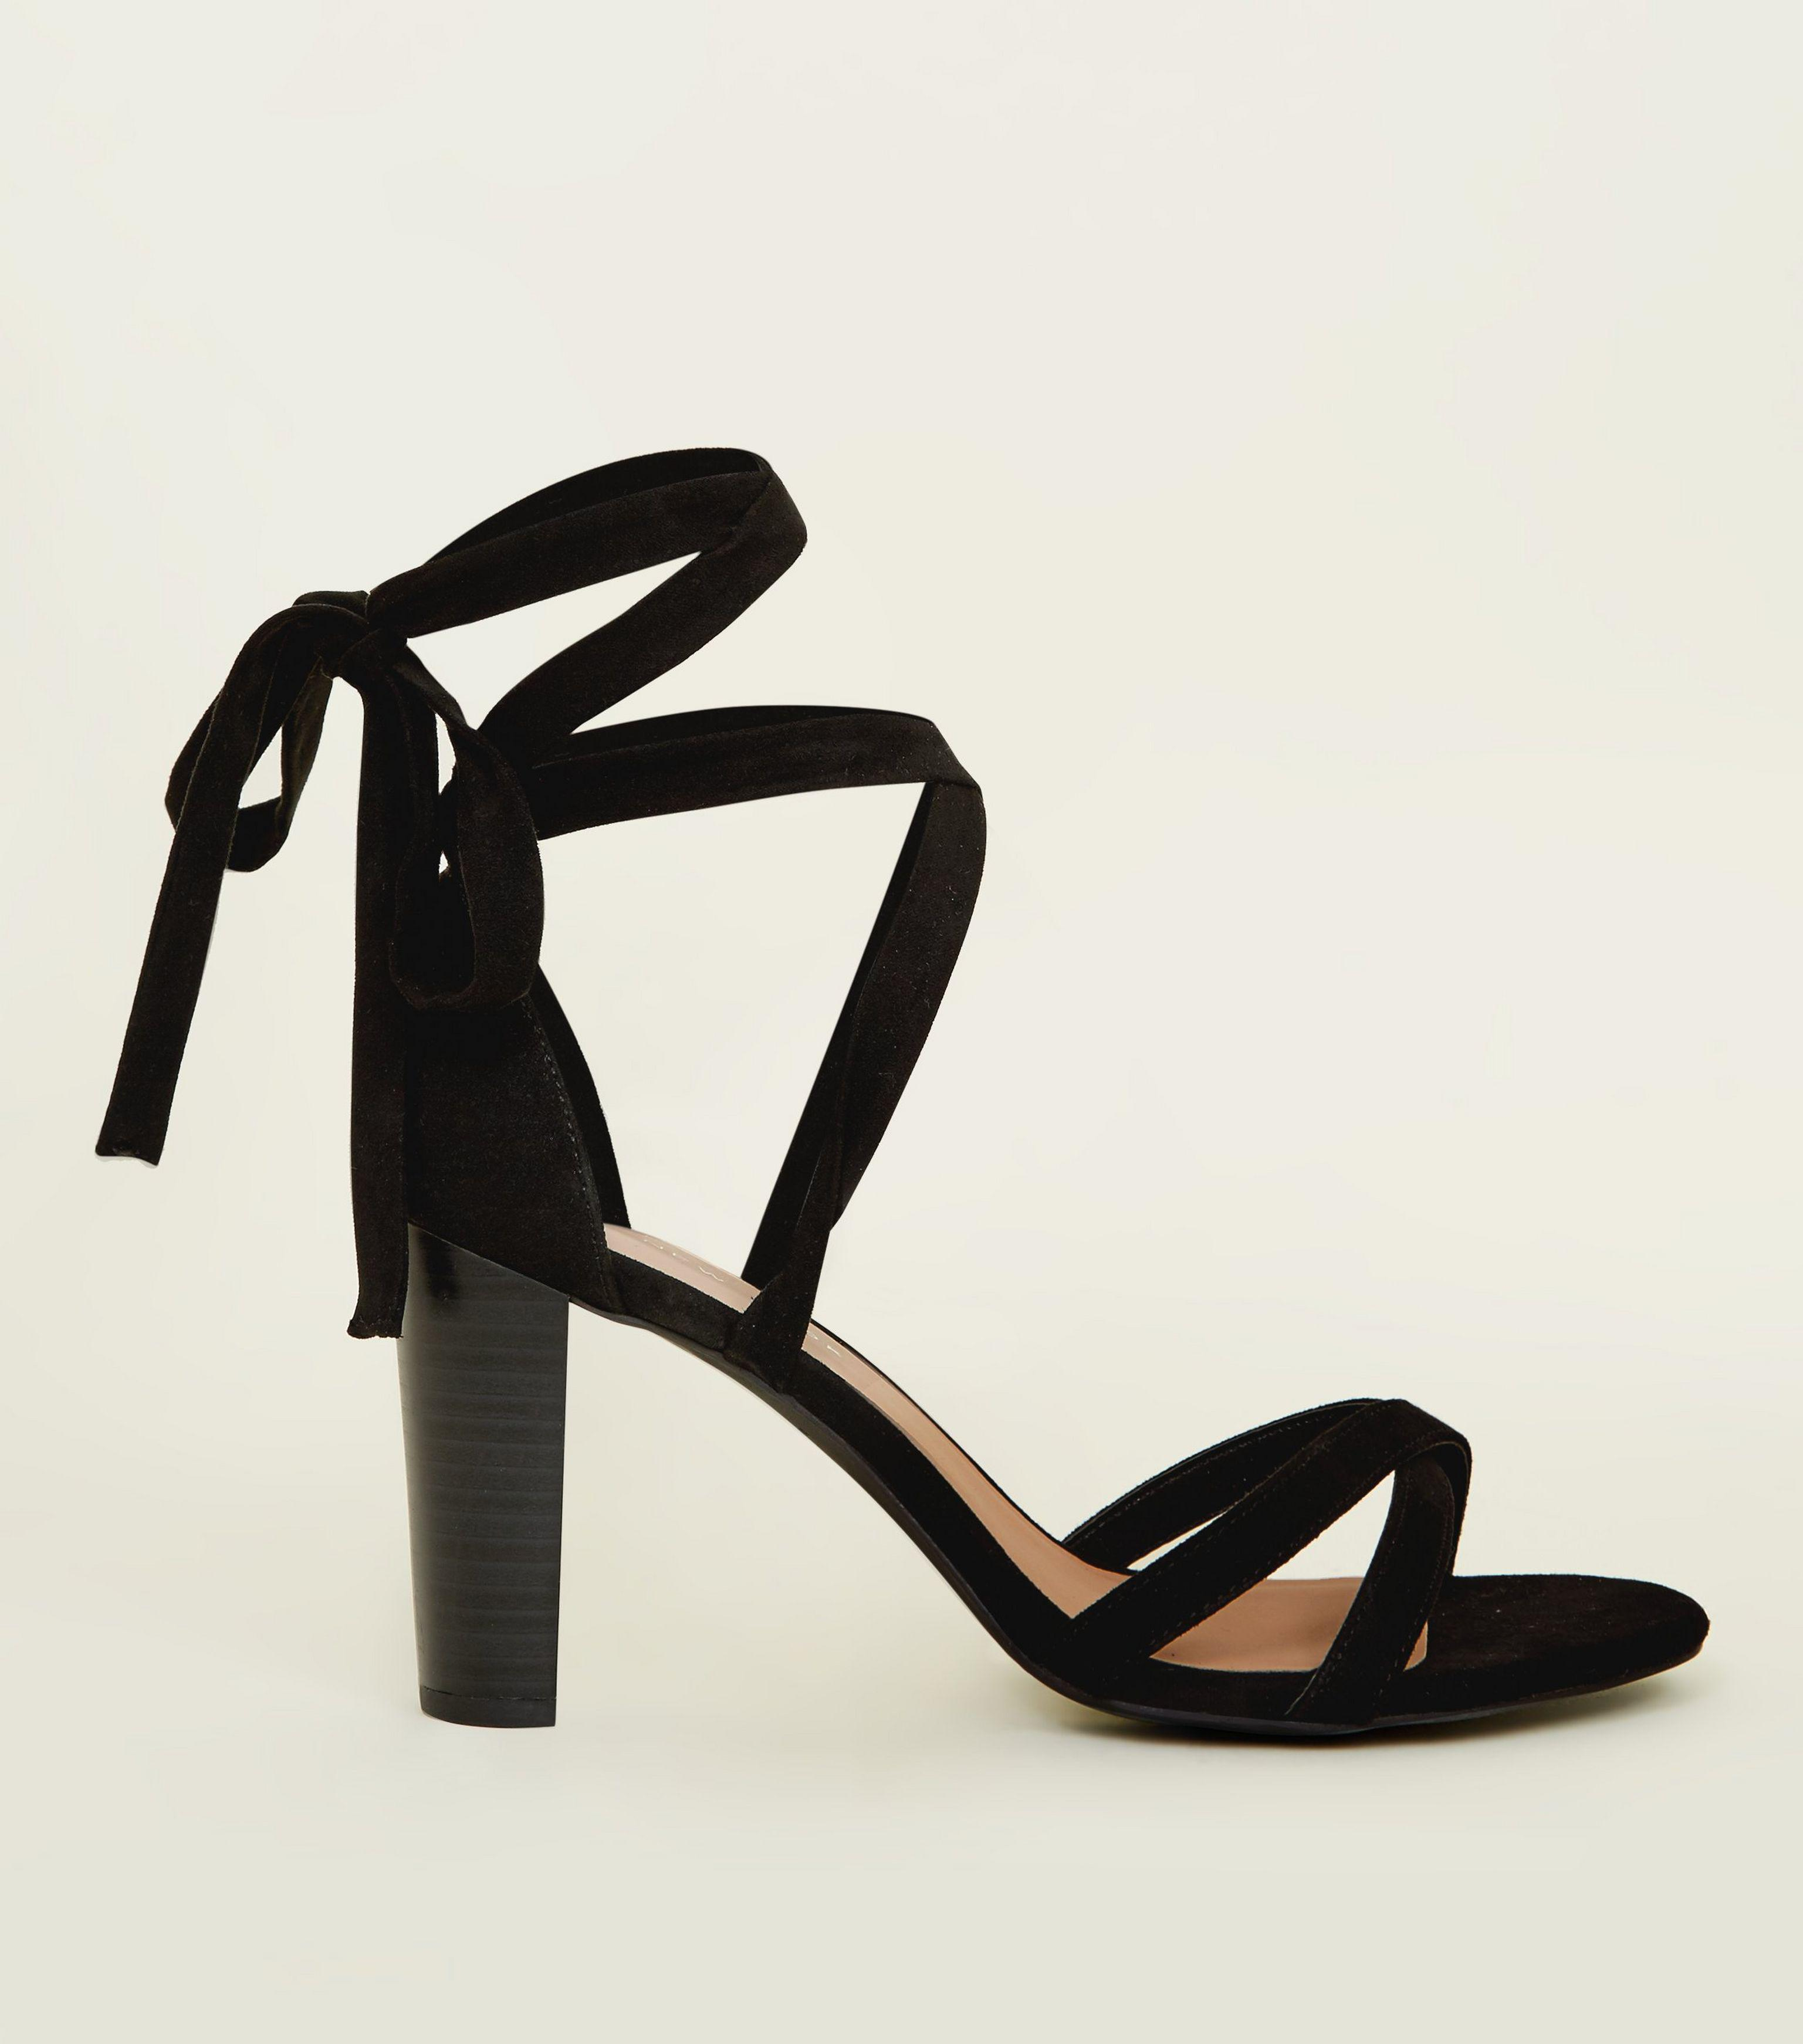 f1aa7a81e12 New Look Wide Fit Black Suedette Ankle Tie Wood Block Heels in Black ...